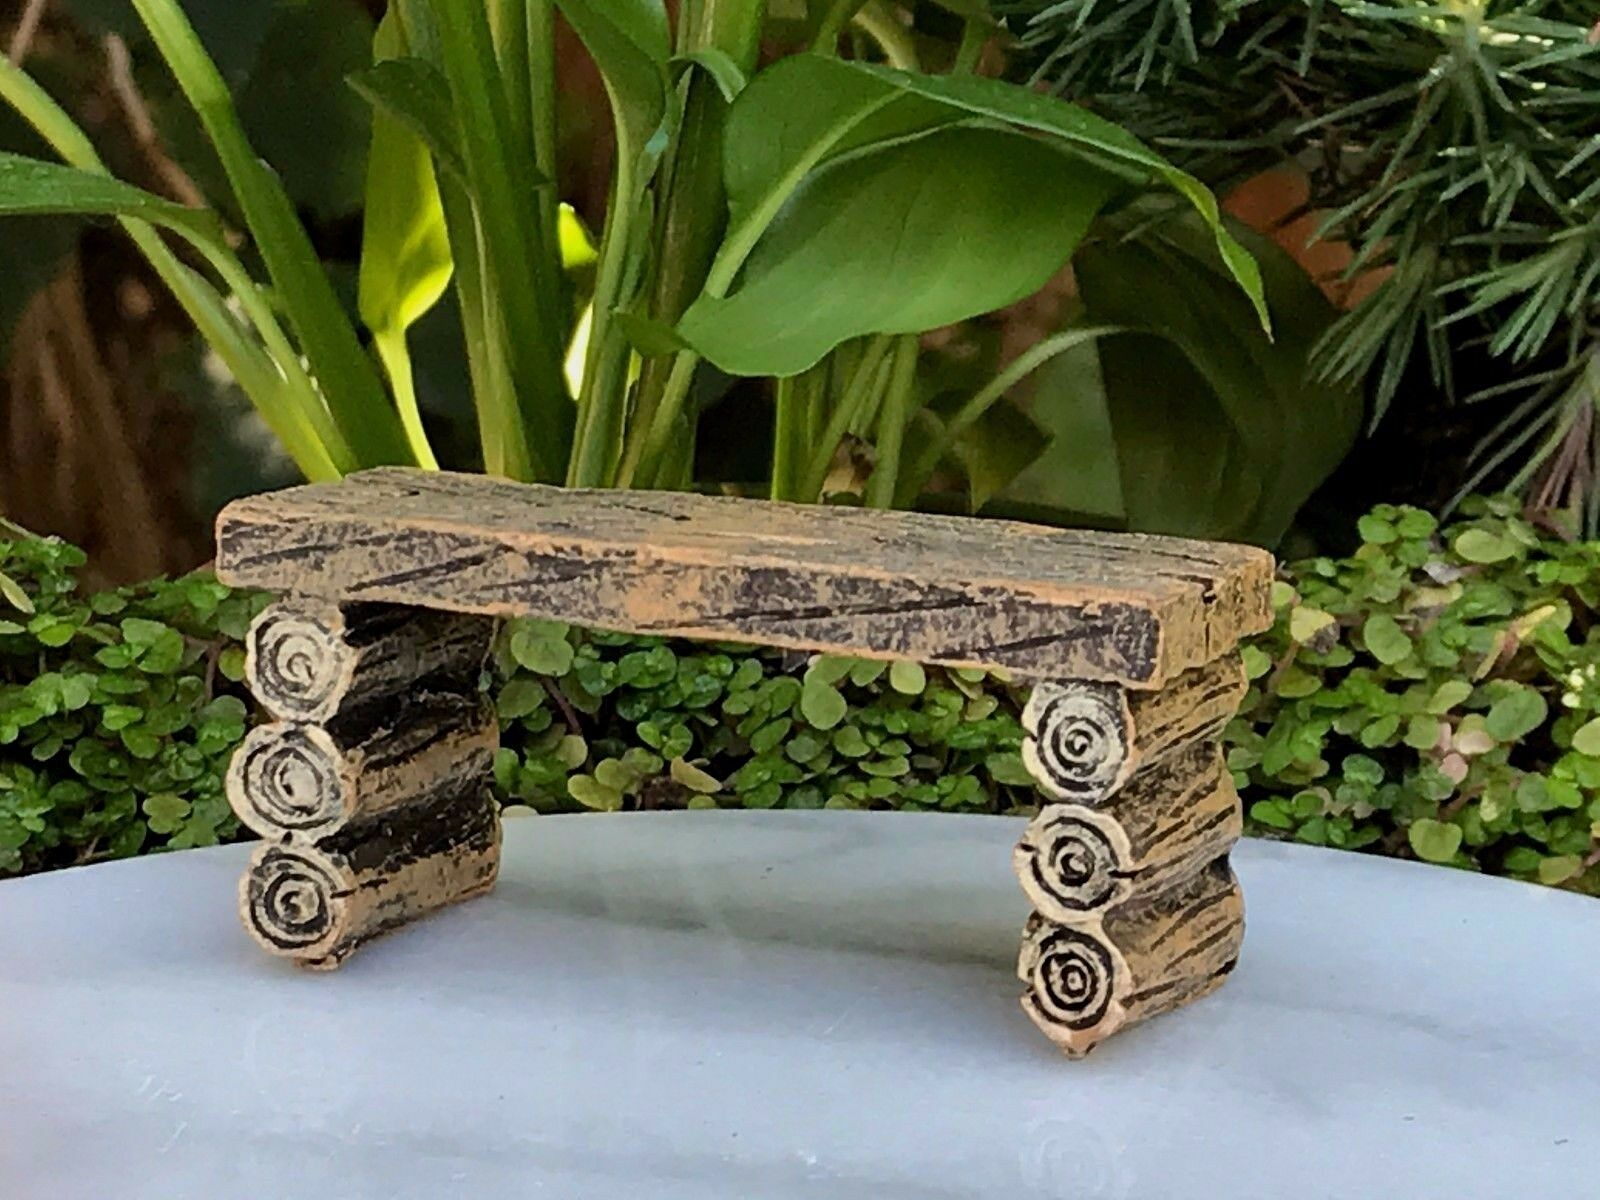 fairy garden furniture. picture 1 of 3 fairy garden furniture s